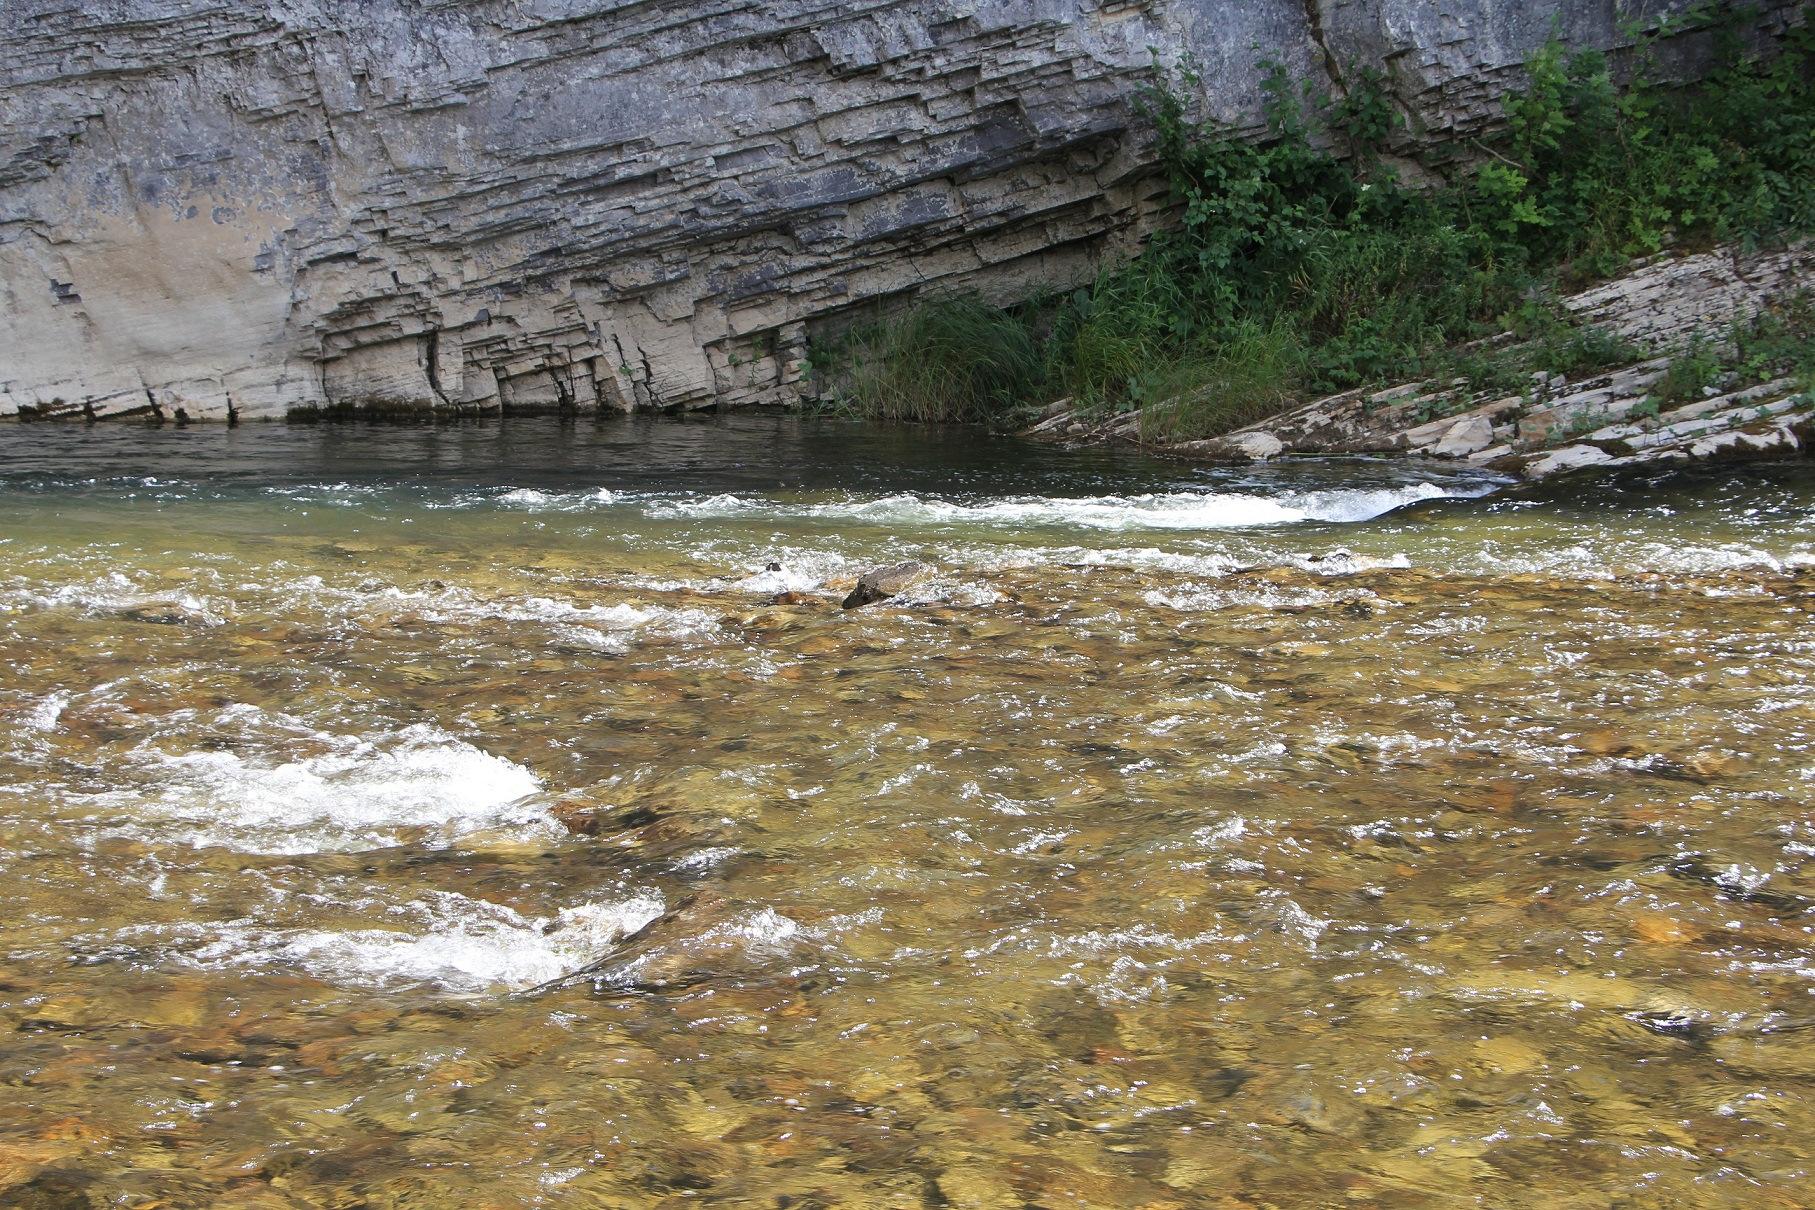 Описание и фото реки зилим